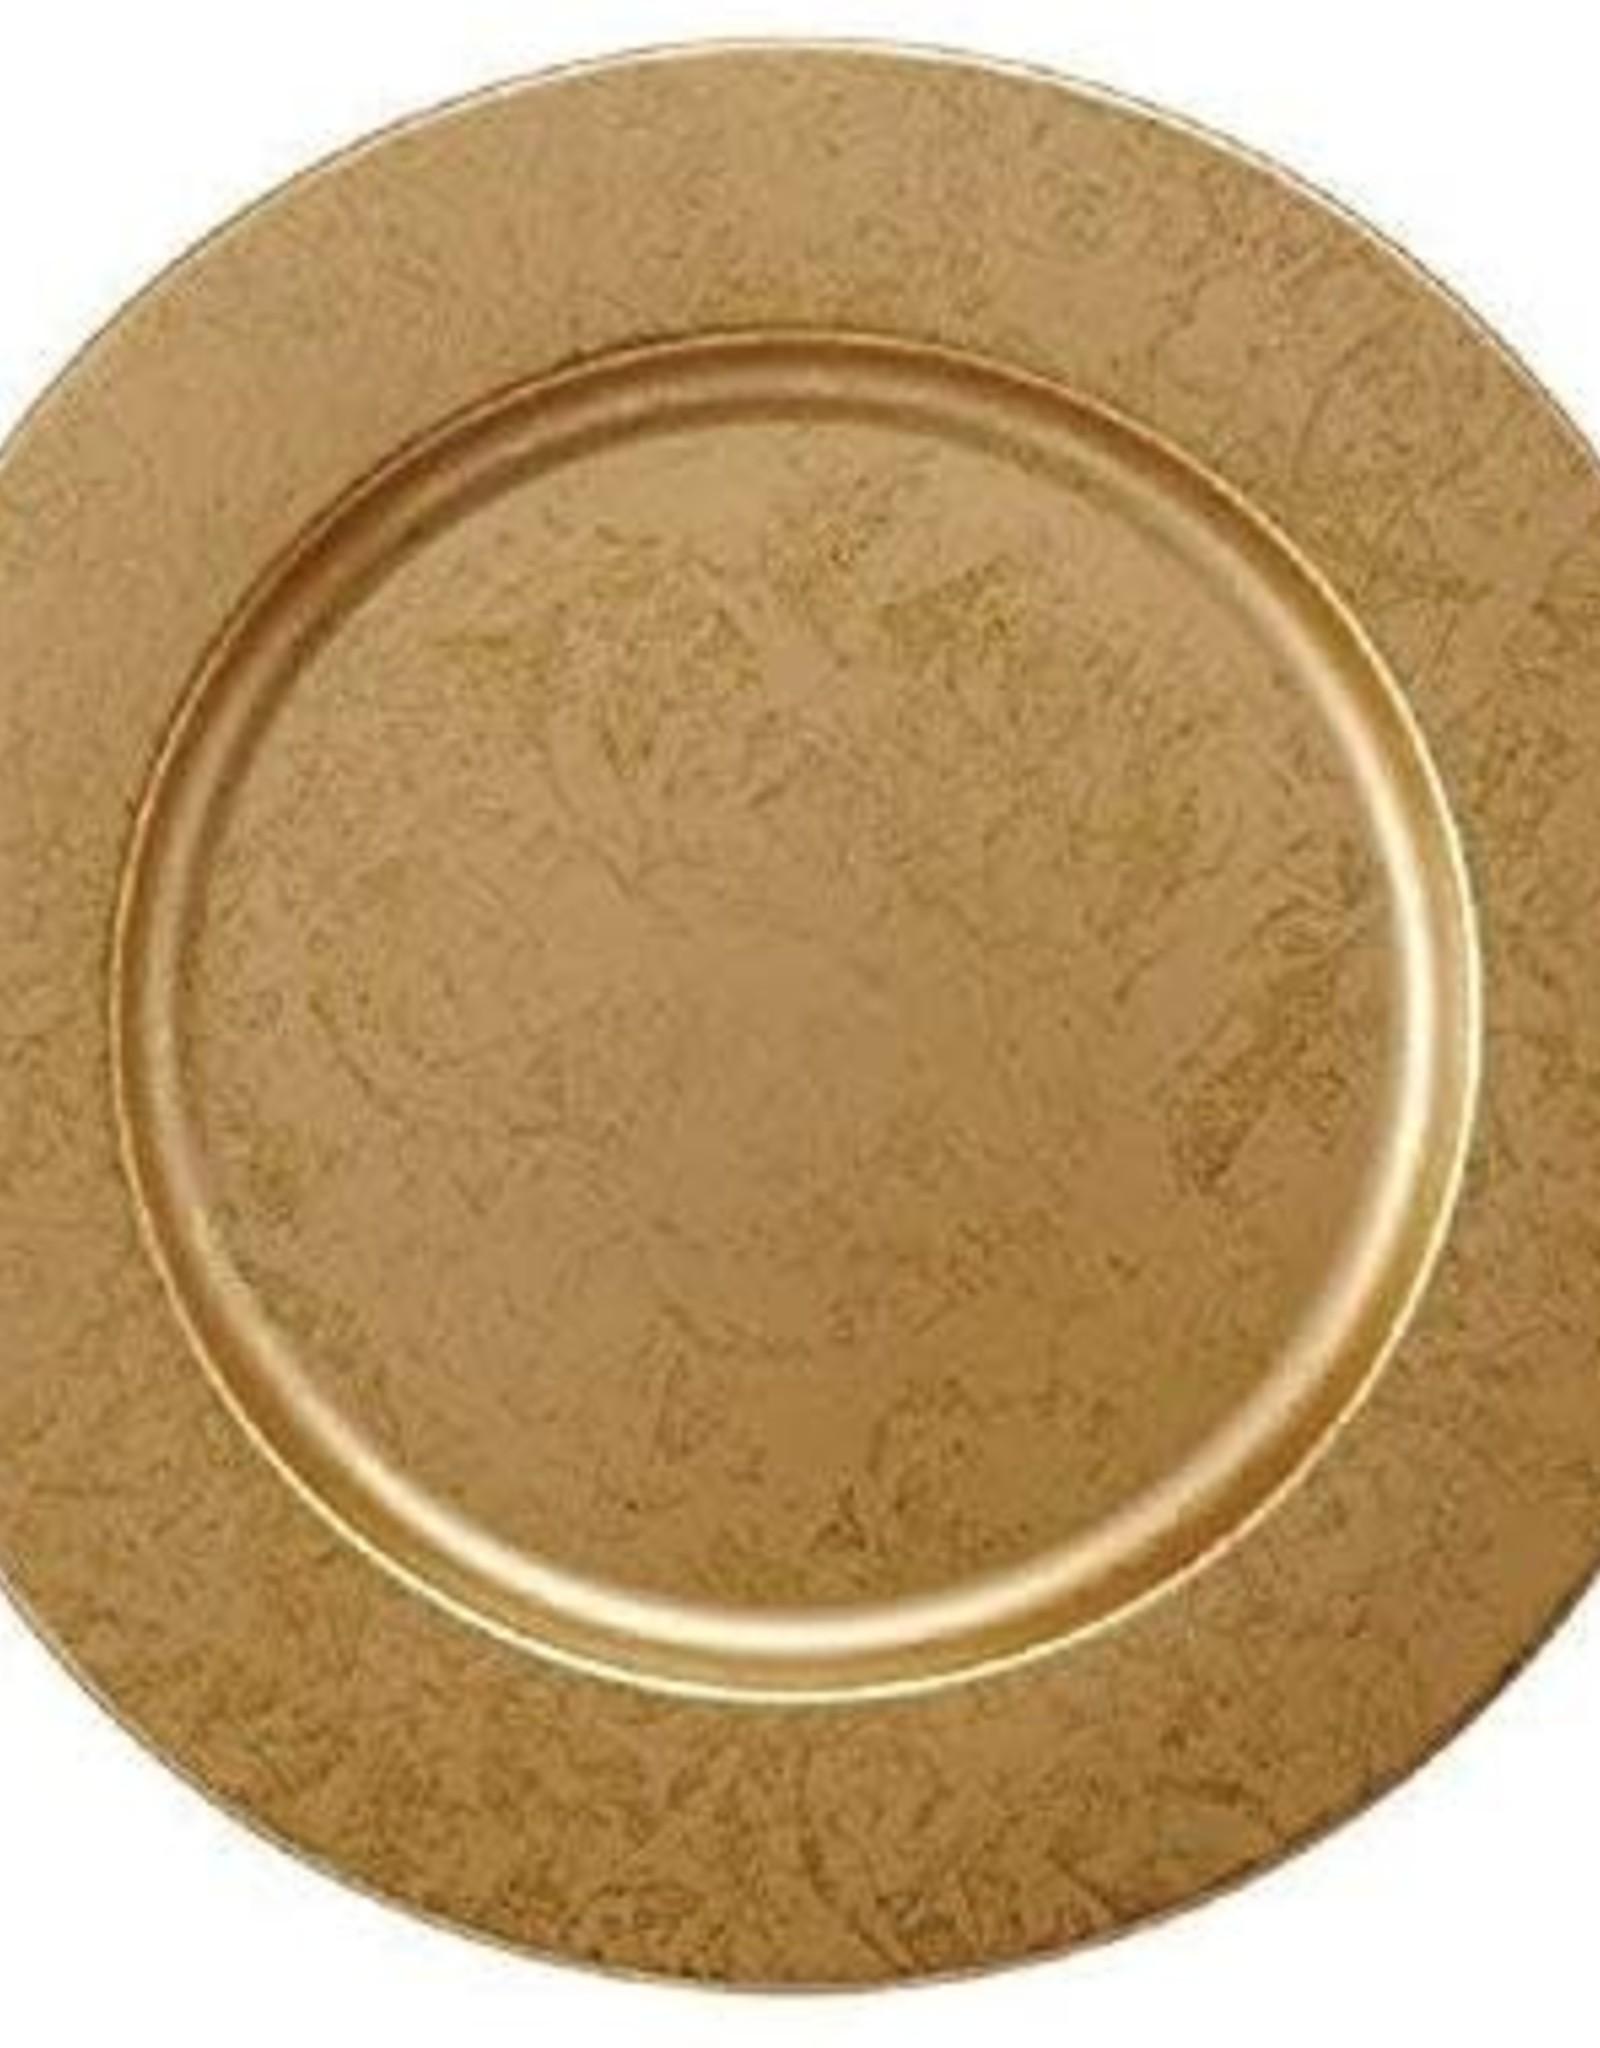 Mud Pie Gold Metallic Charger